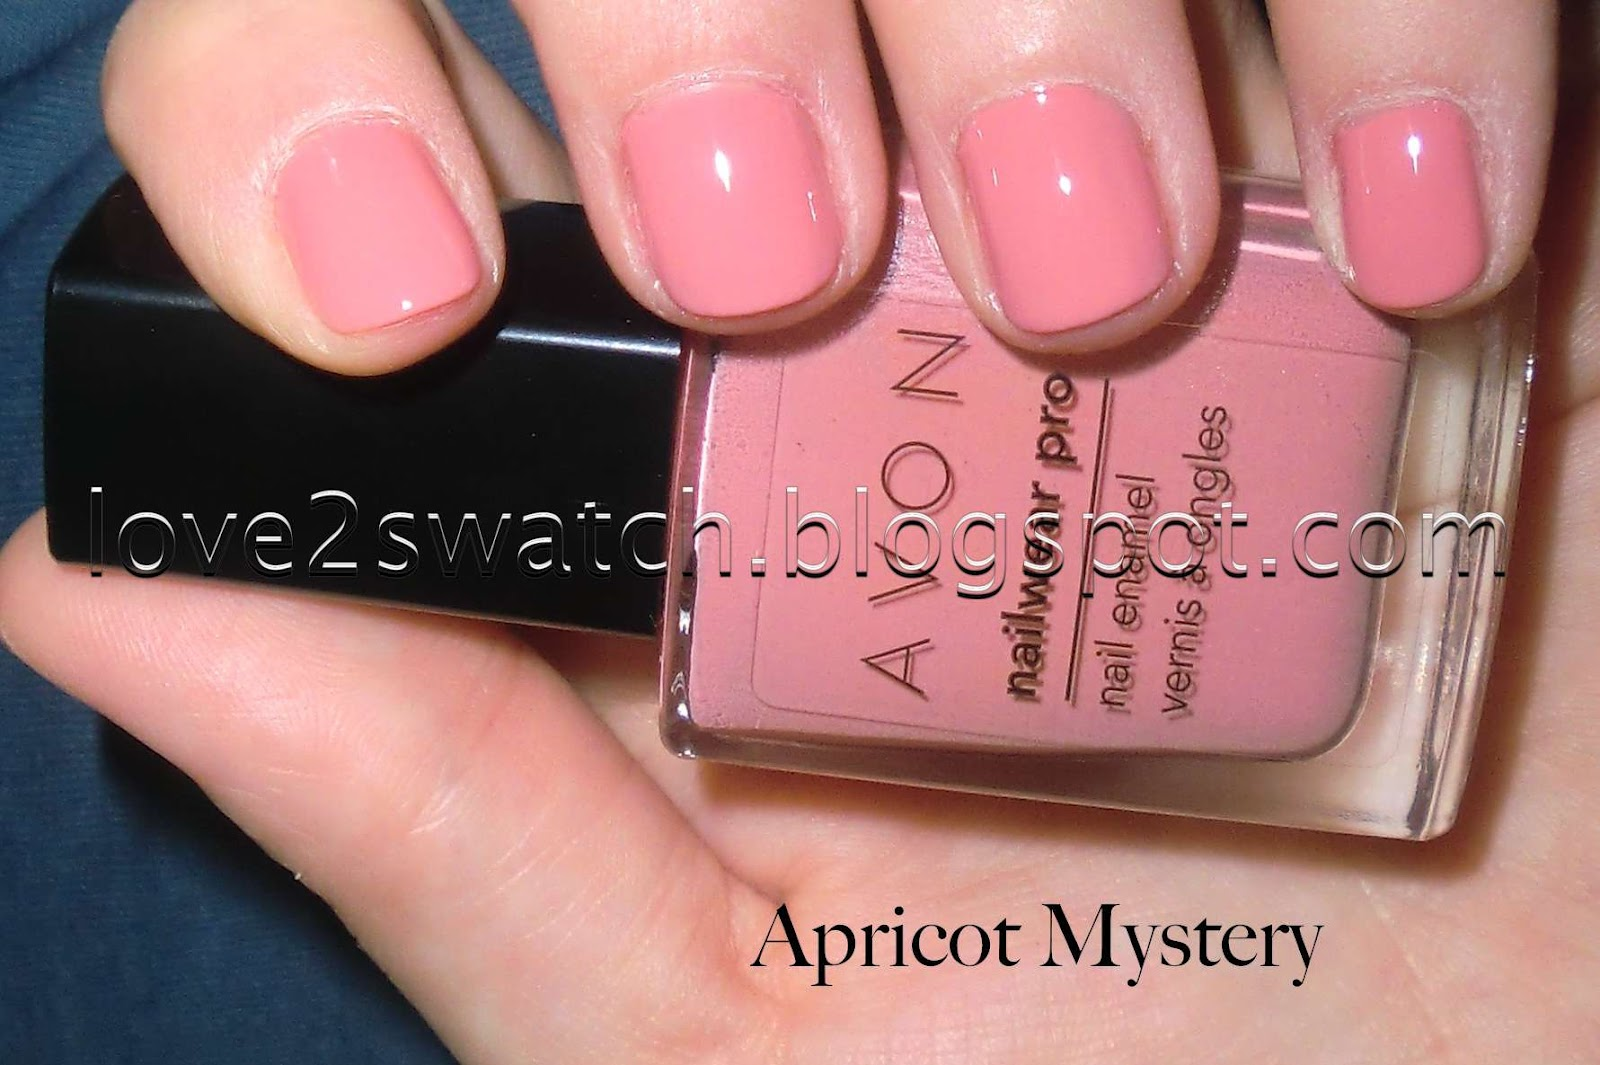 Love2swatch Avon Nail Polish Swatches 2